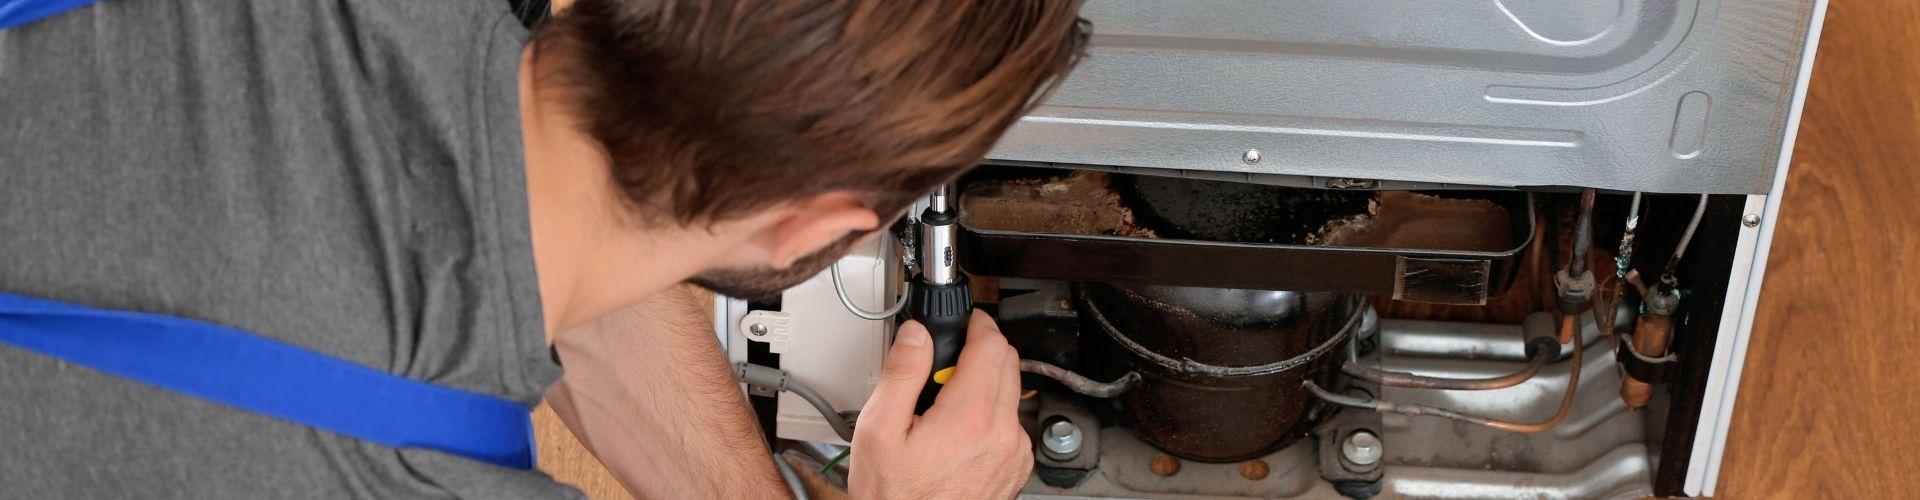 refrigerator repair Washington DC